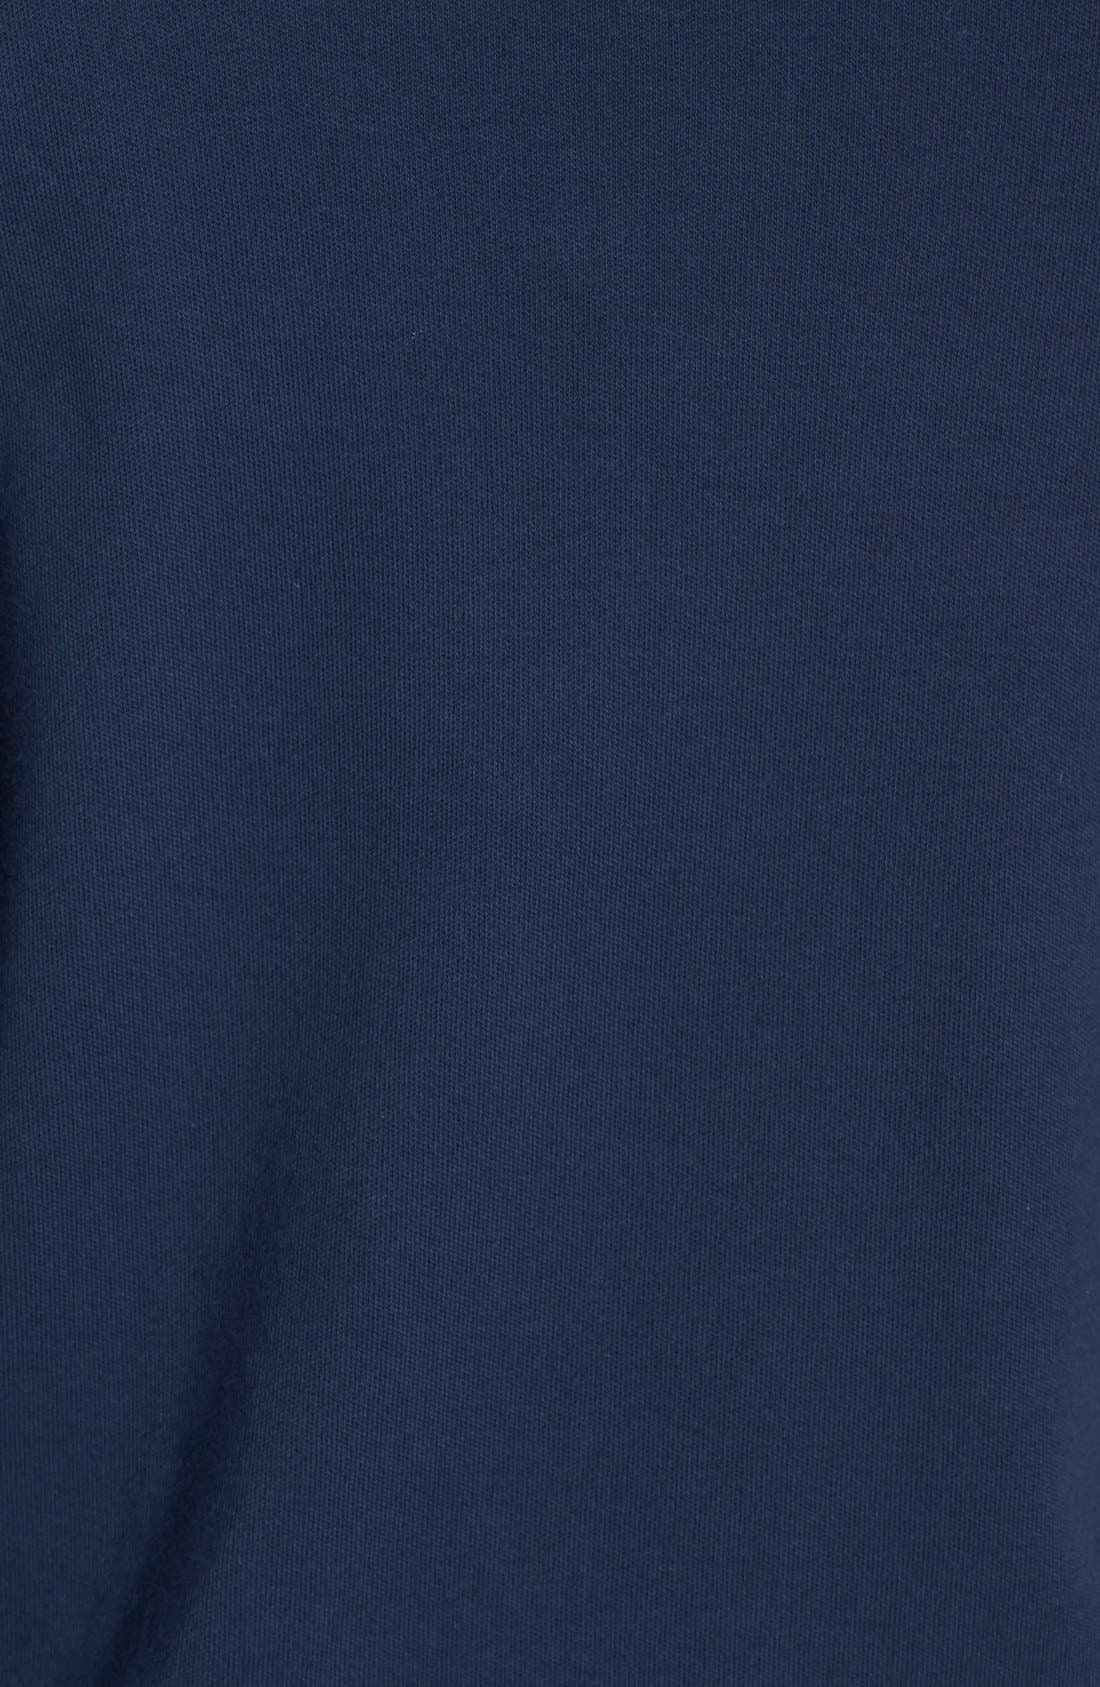 Alternate Image 3  - Vineyard Vines Quarter Zip Cotton Jersey Sweatshirt